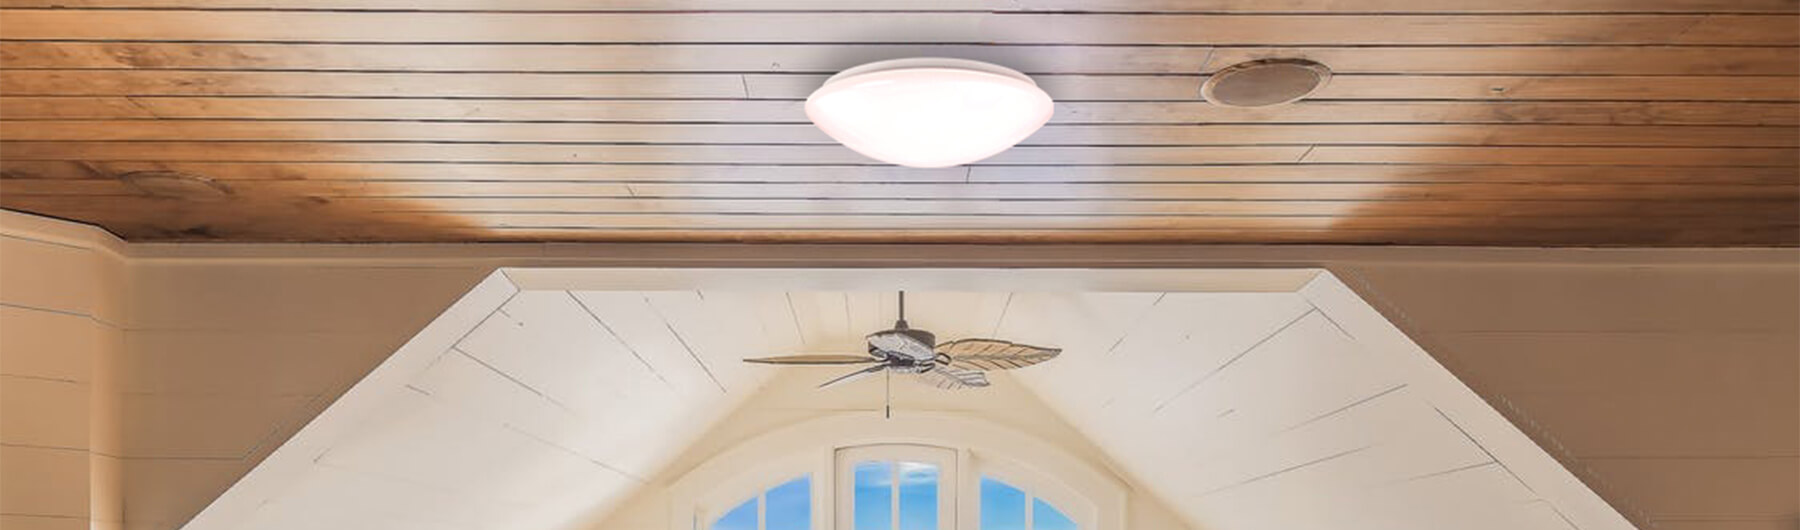 LED Oyster & LED Wall Lights